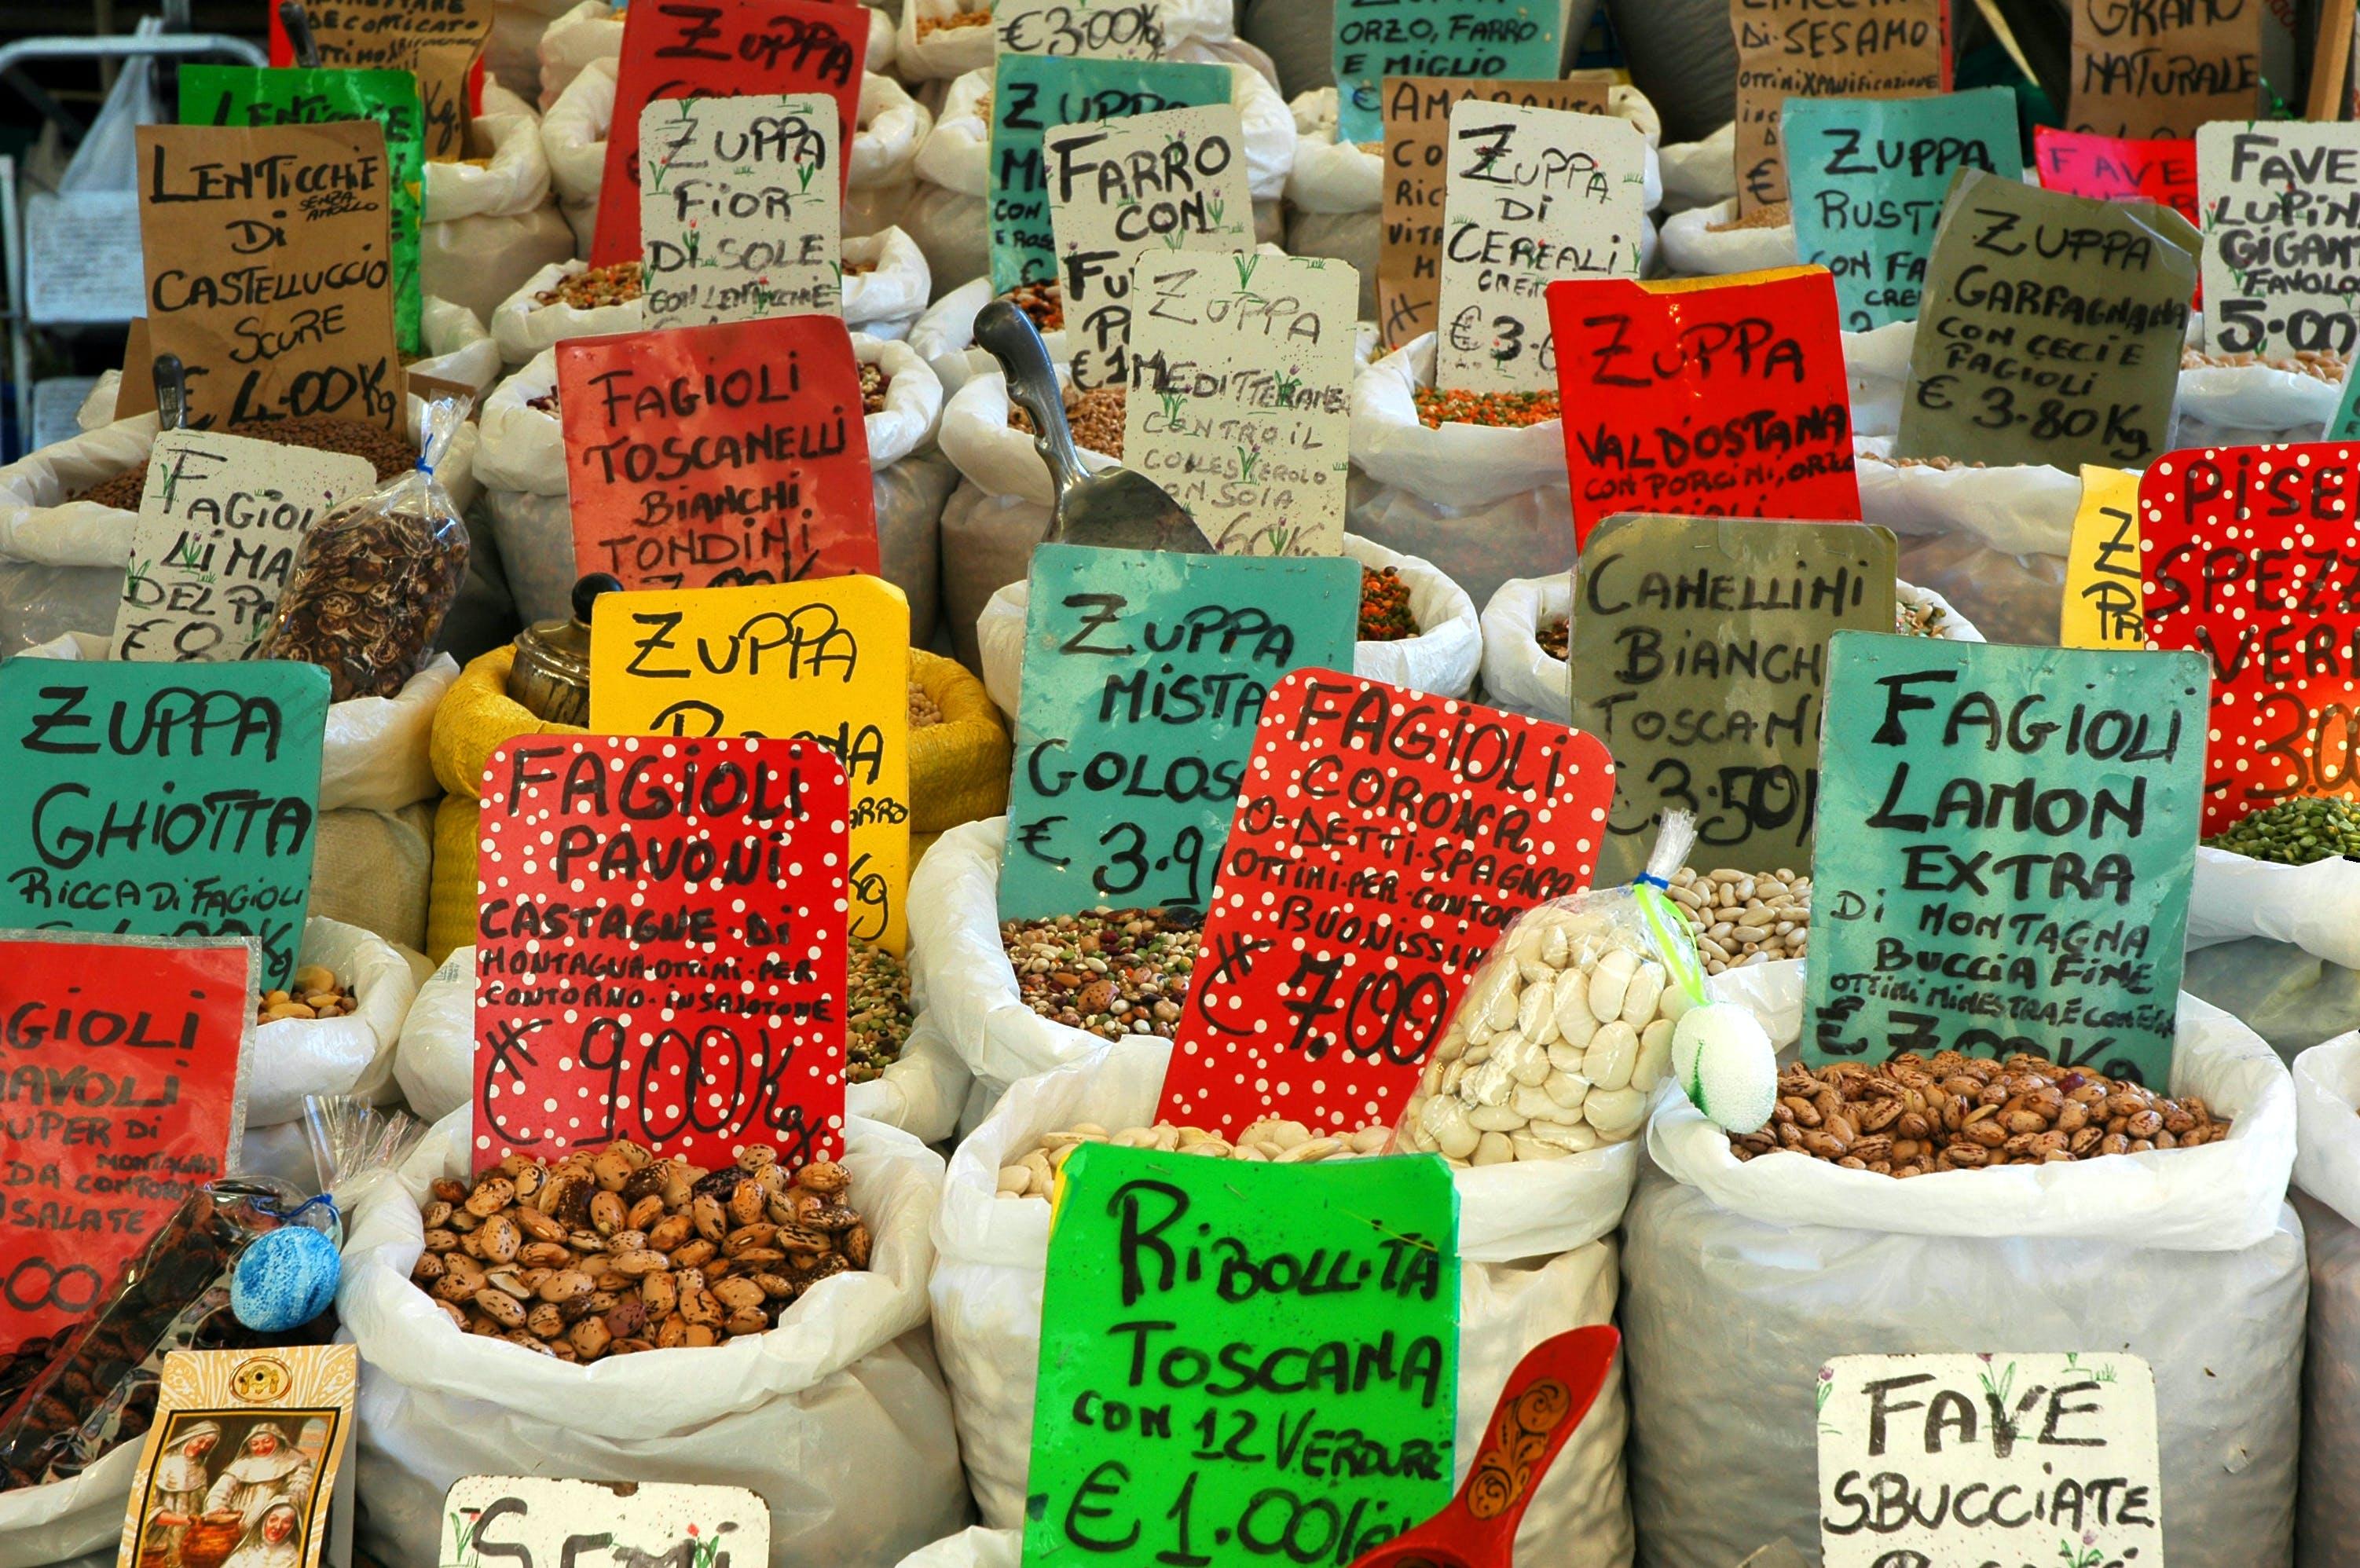 Assorted Beans in White Sacks